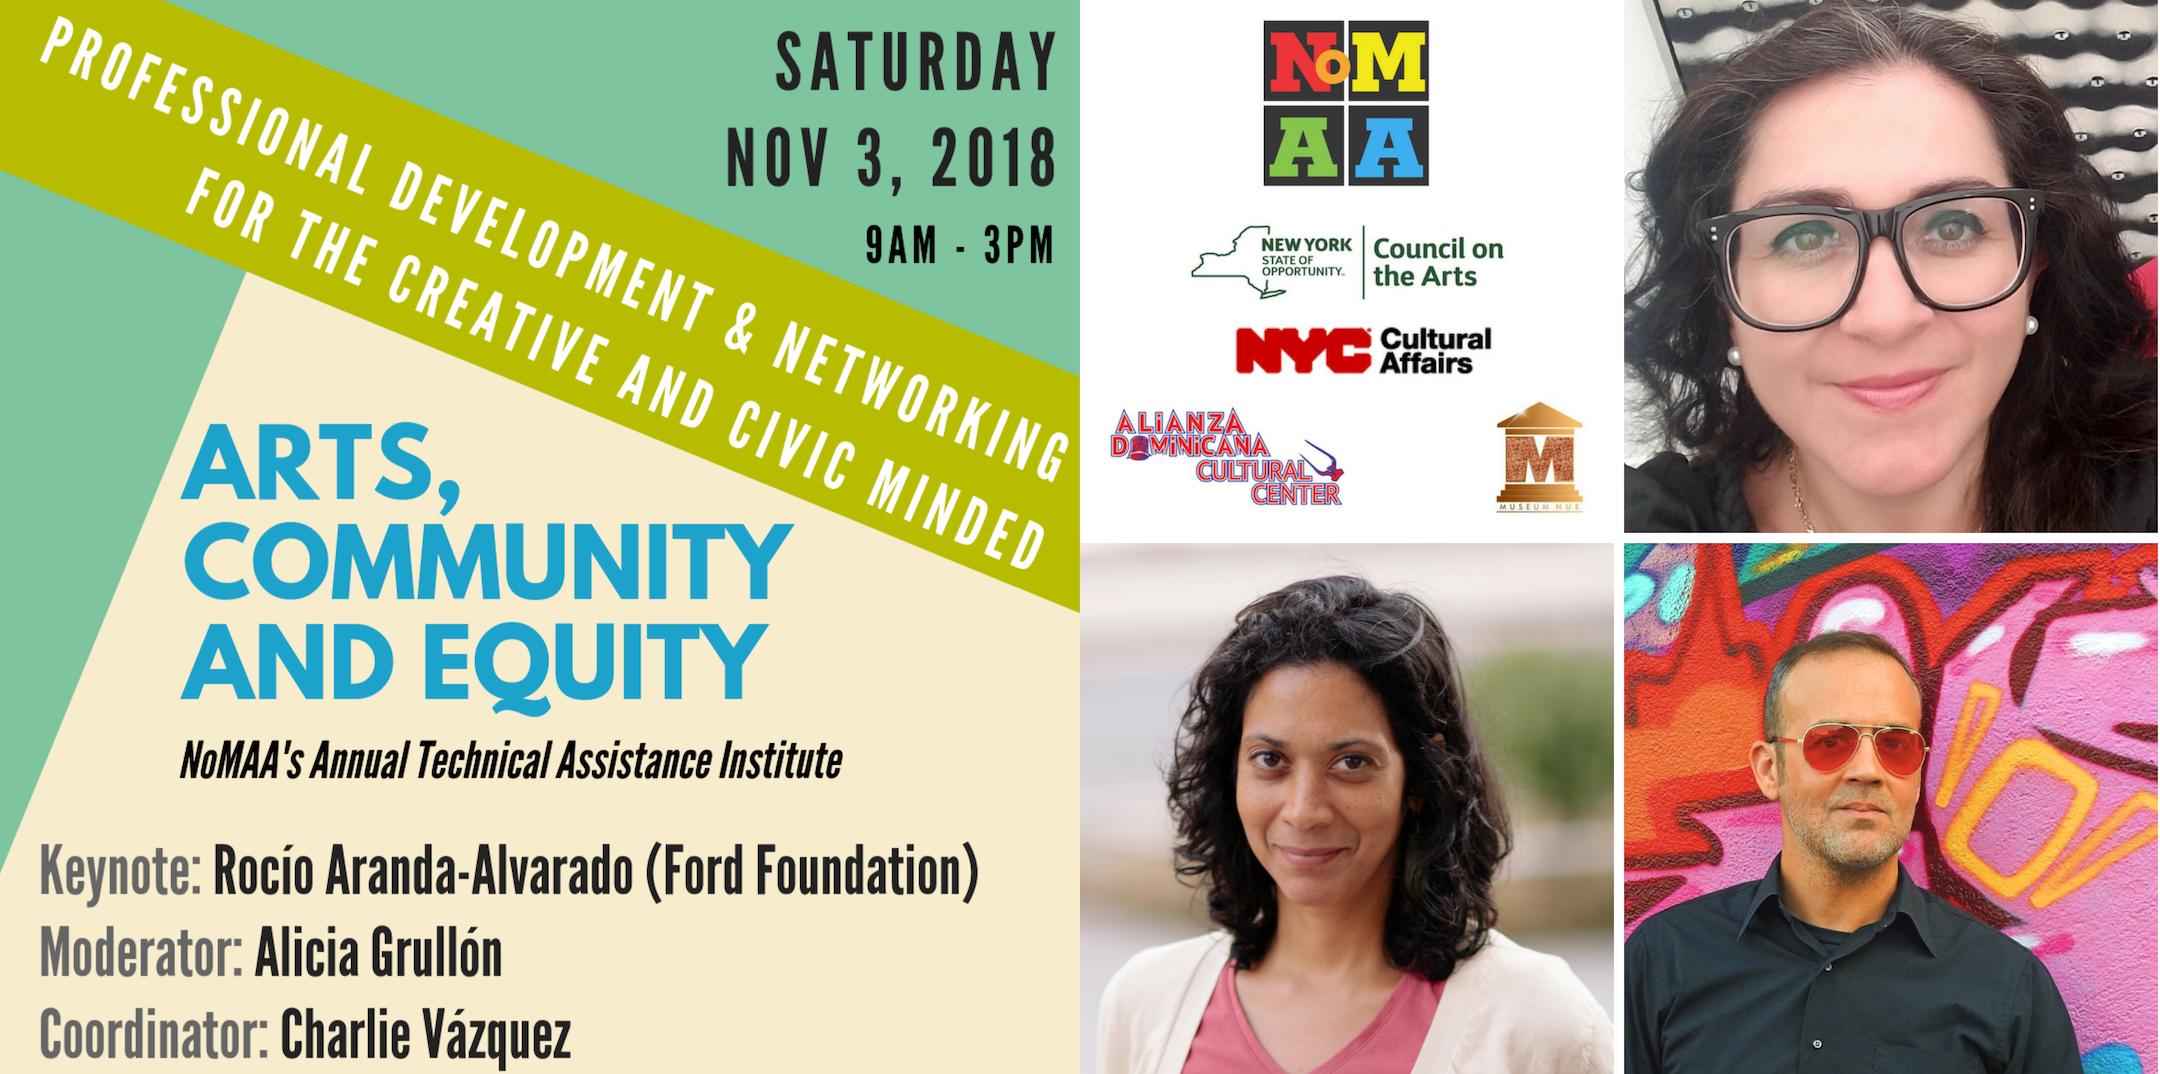 Arts, Community and Equity – Northern Manhattan Arts Alliance